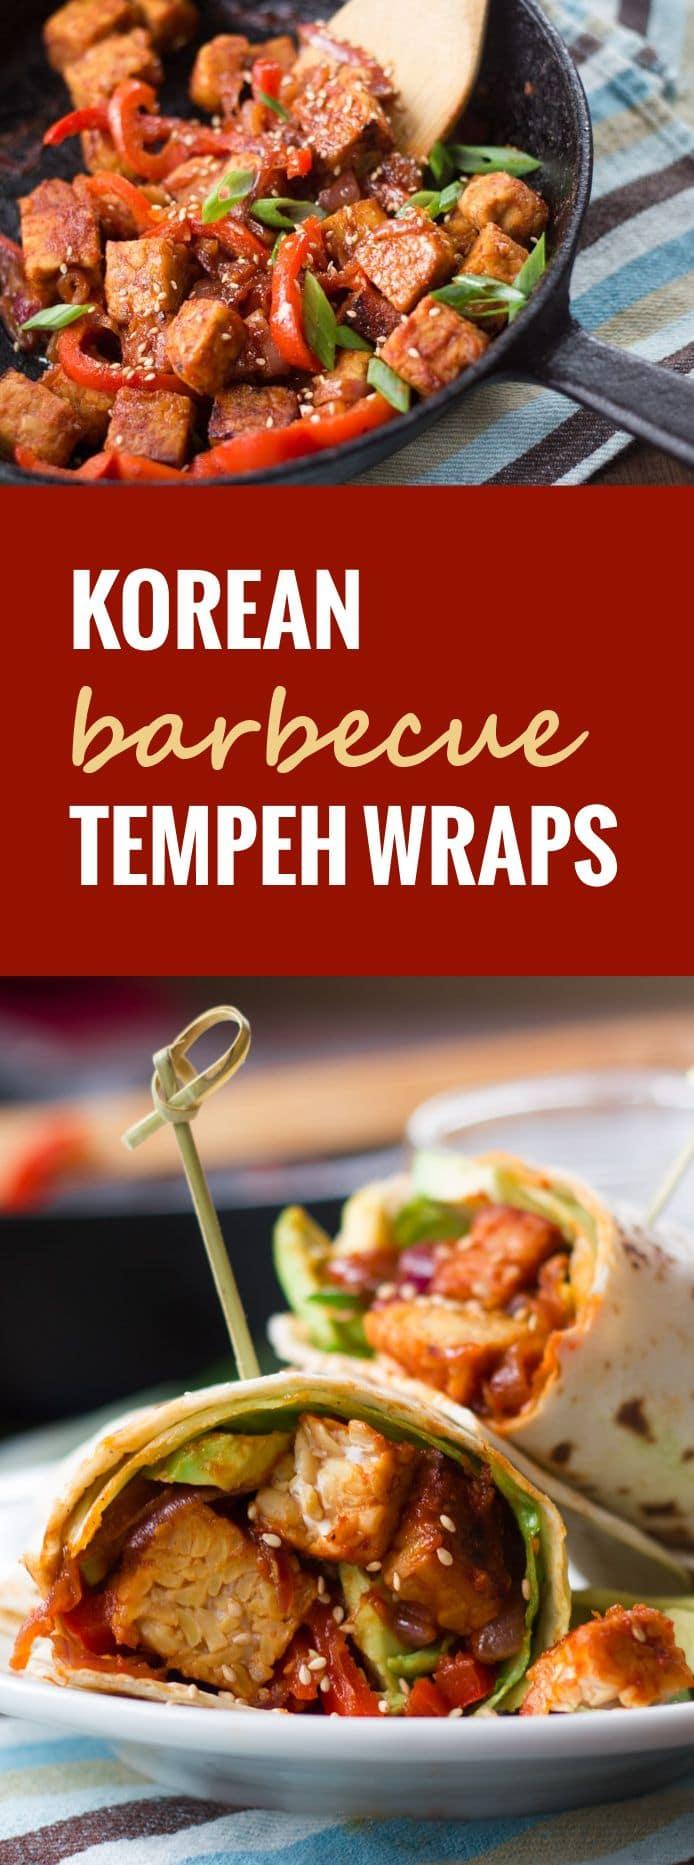 Korean Barbecue Tempeh Wraps